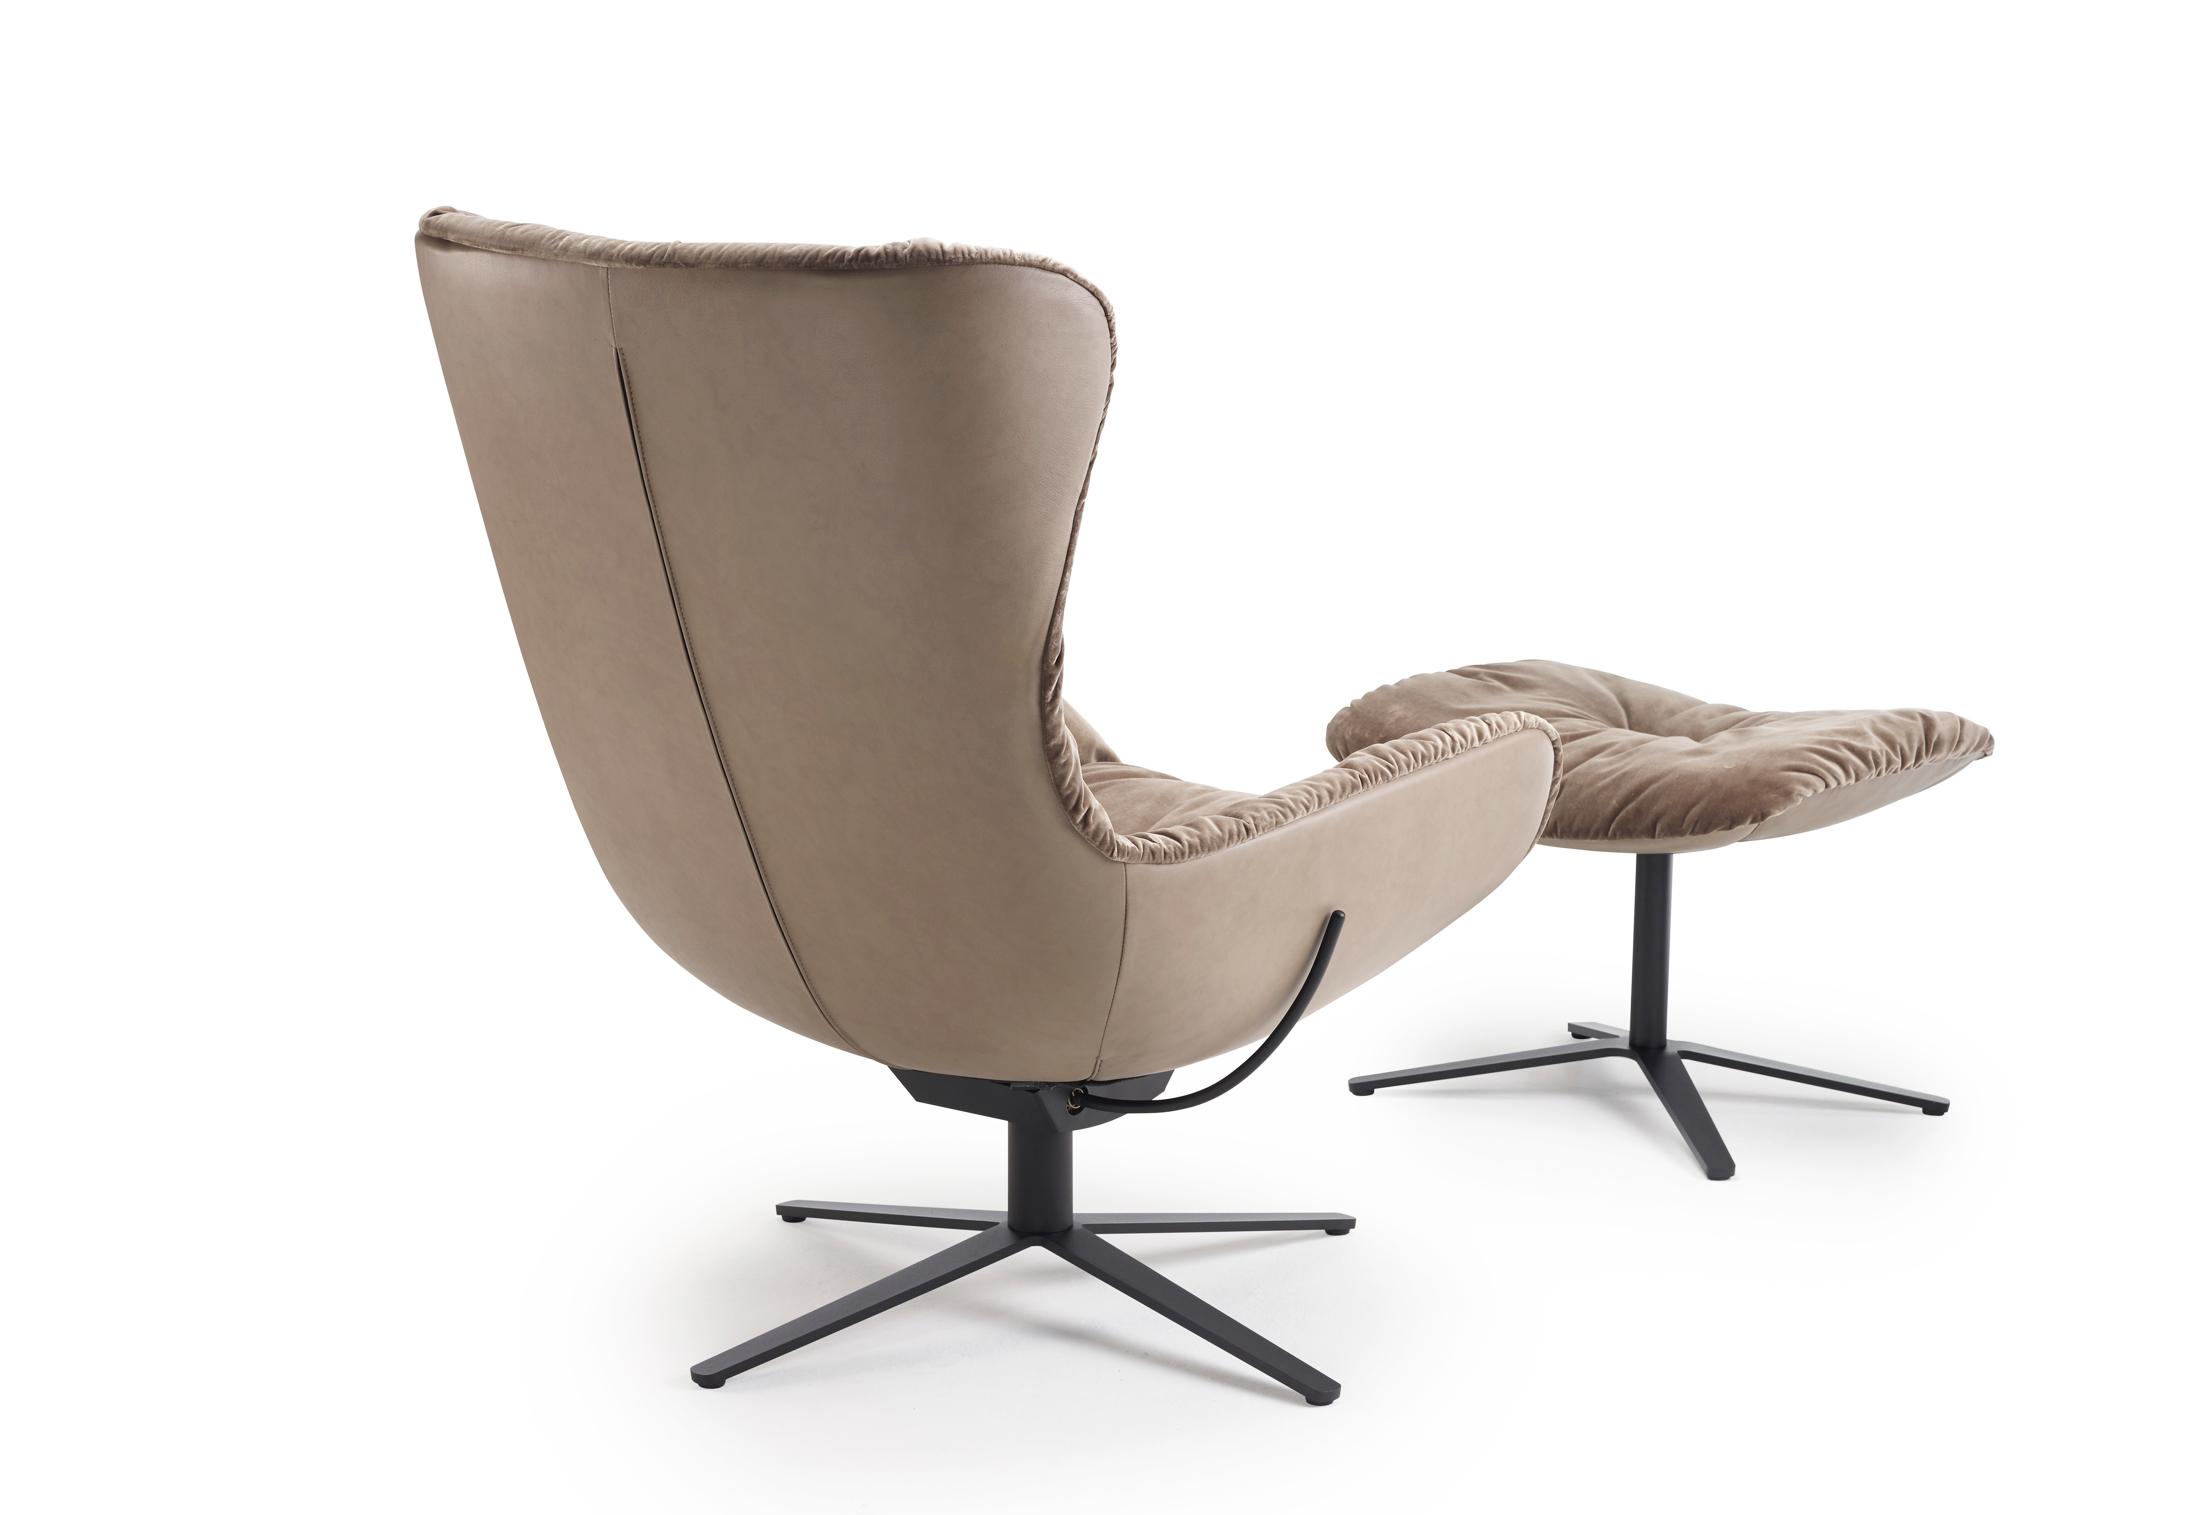 Leya Wingback Chair With Rocker Tilt Mechanism And X Base